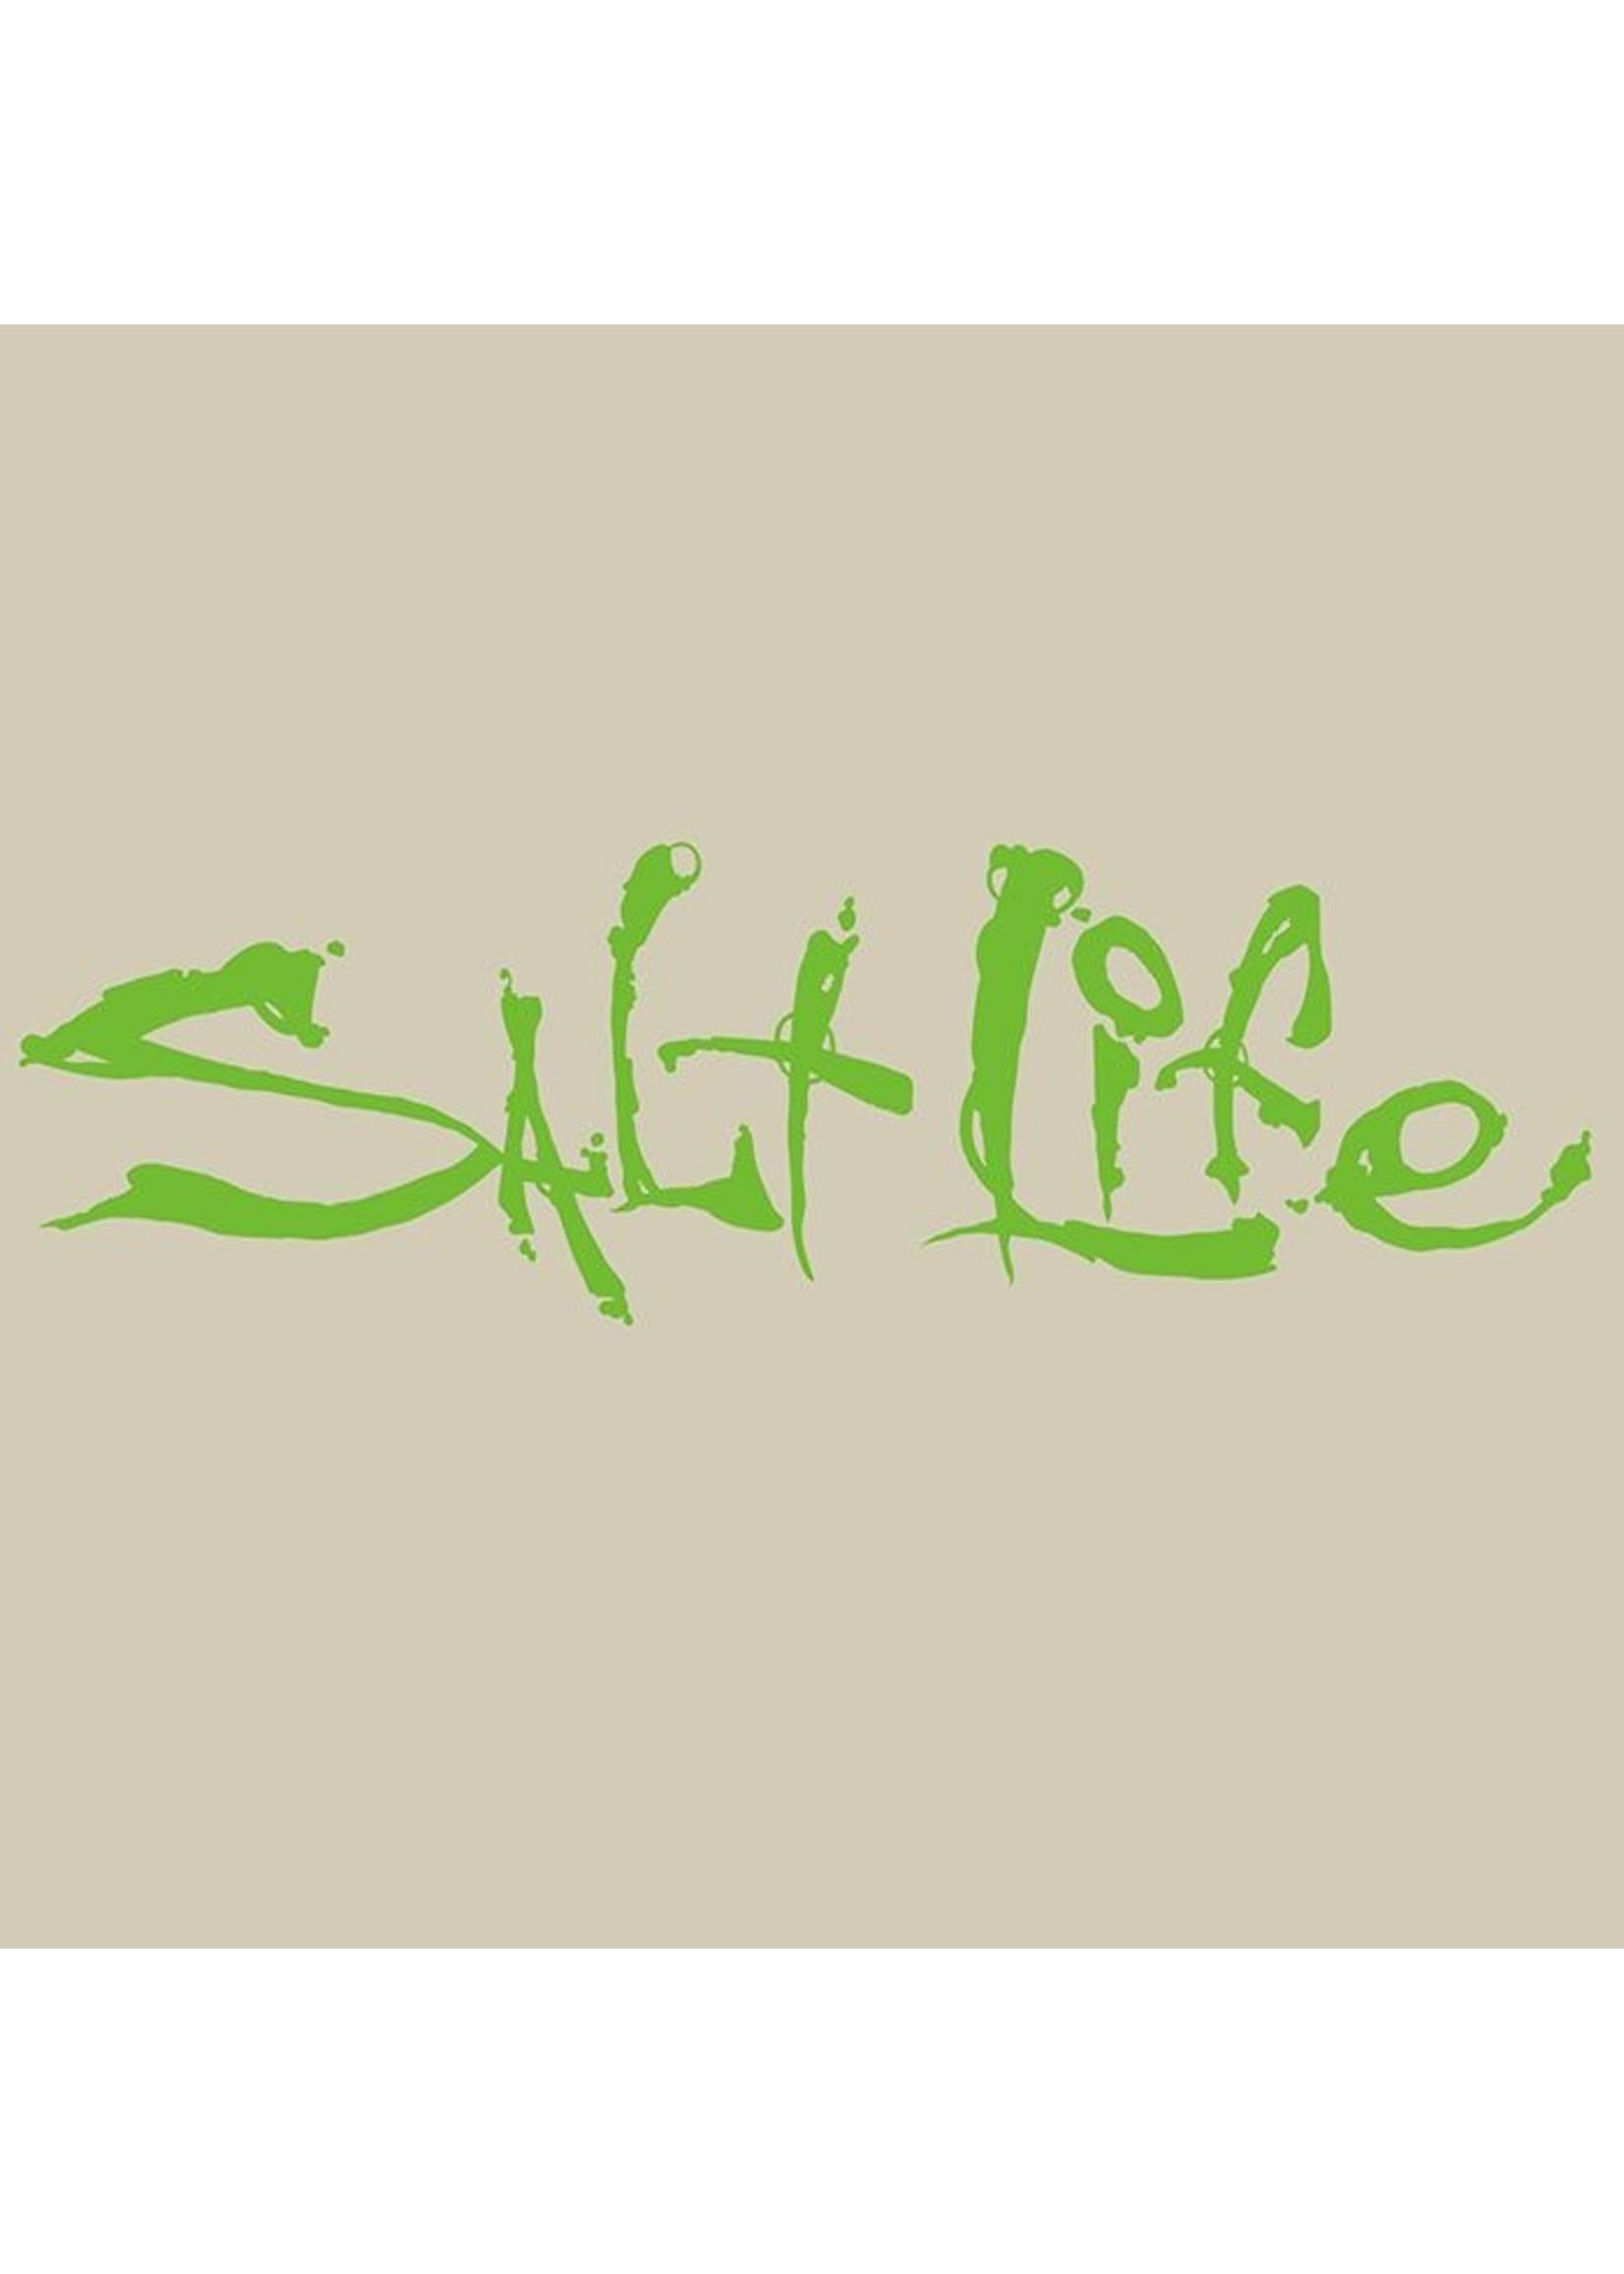 Salt Life Signature Medium  Decal